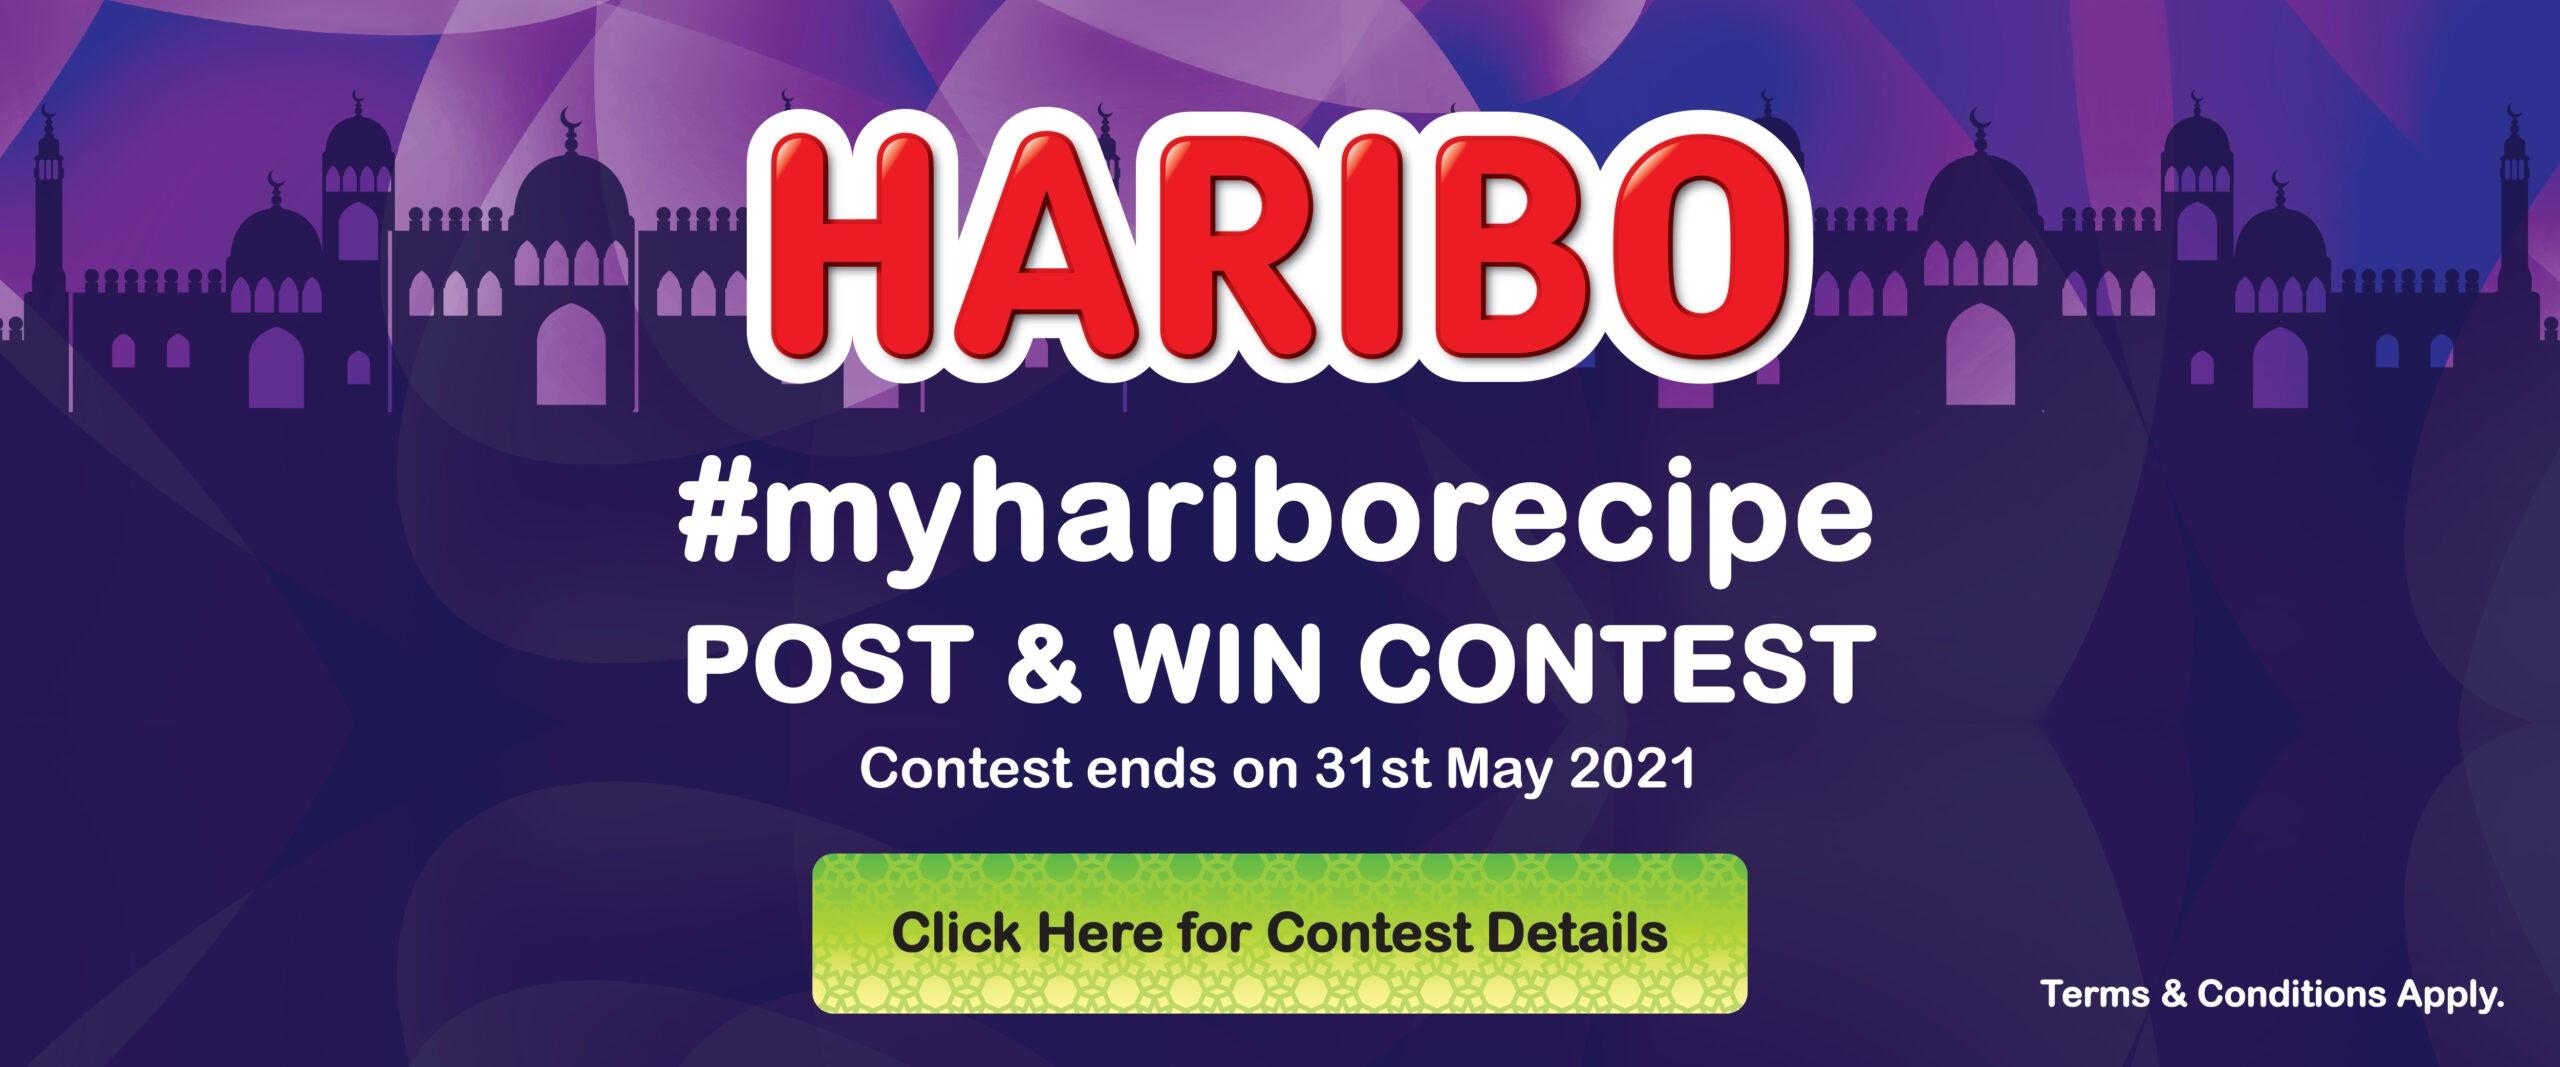 HARIBO_Raya_Contest_BannerAd